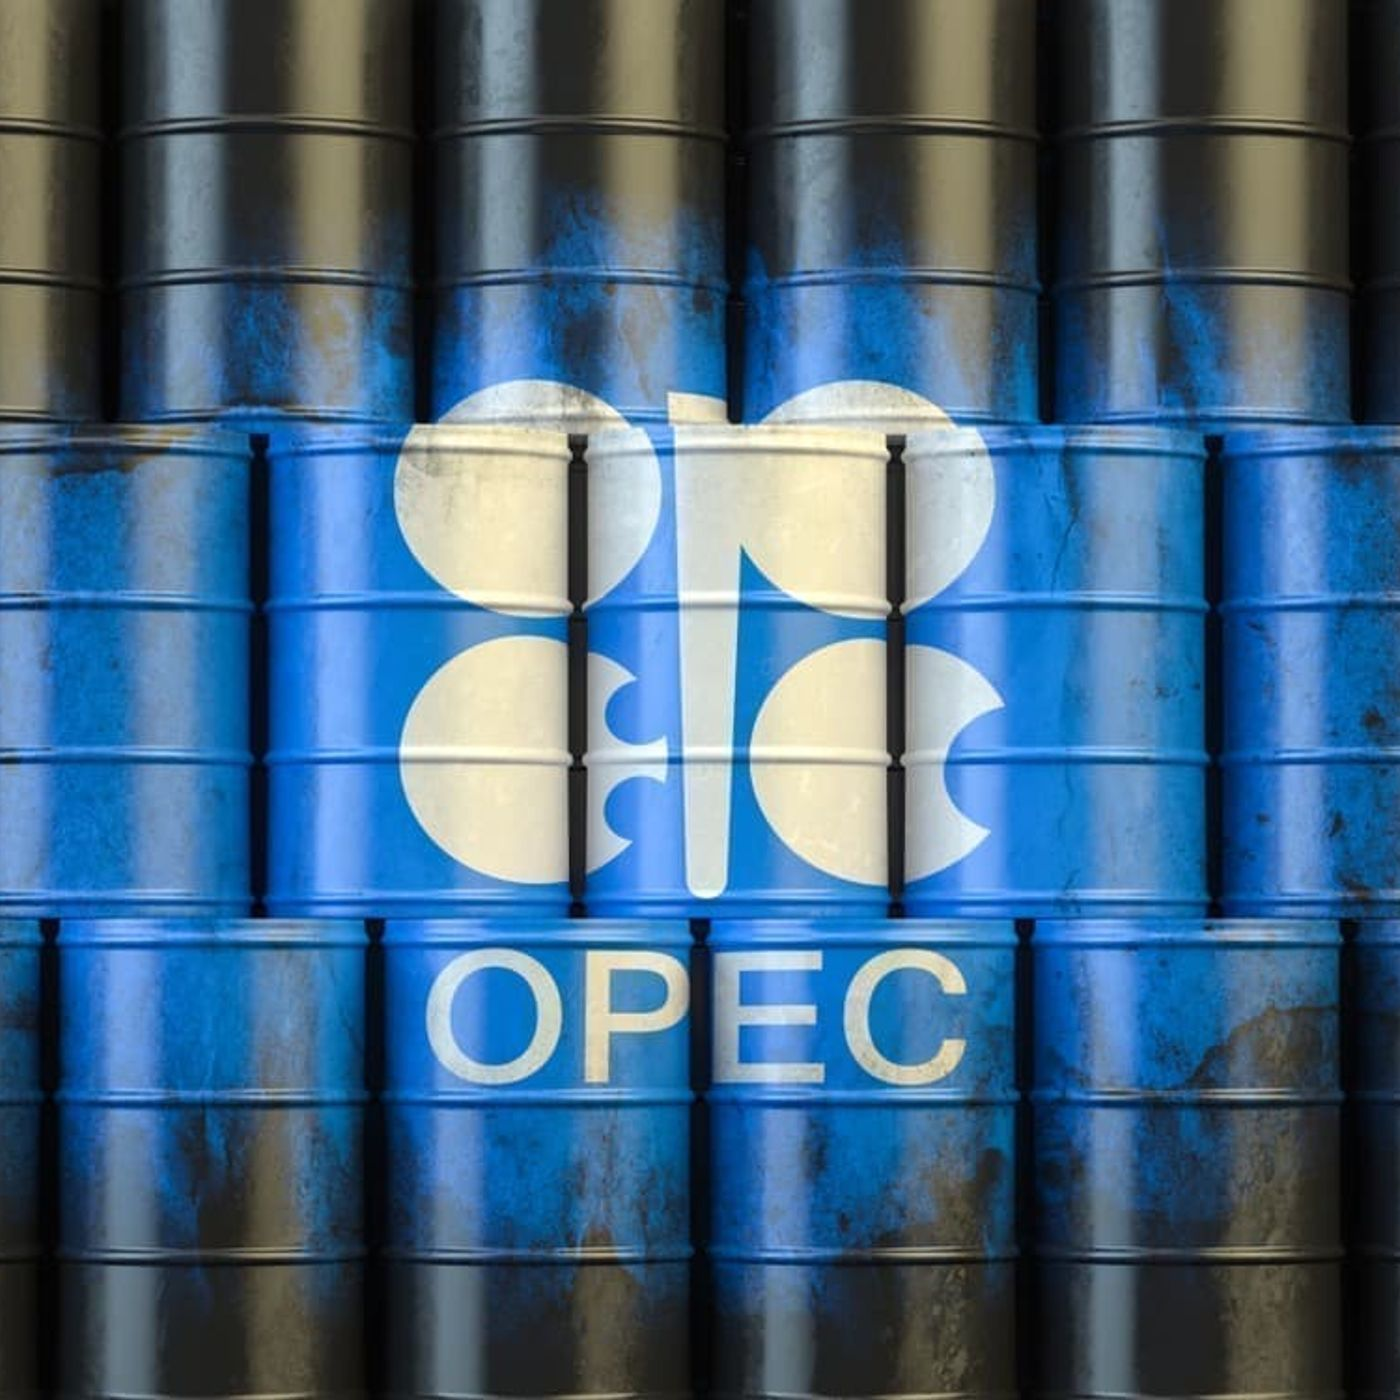 OPEC Sunders Itself:  Fragile Geopolitics, Failed States